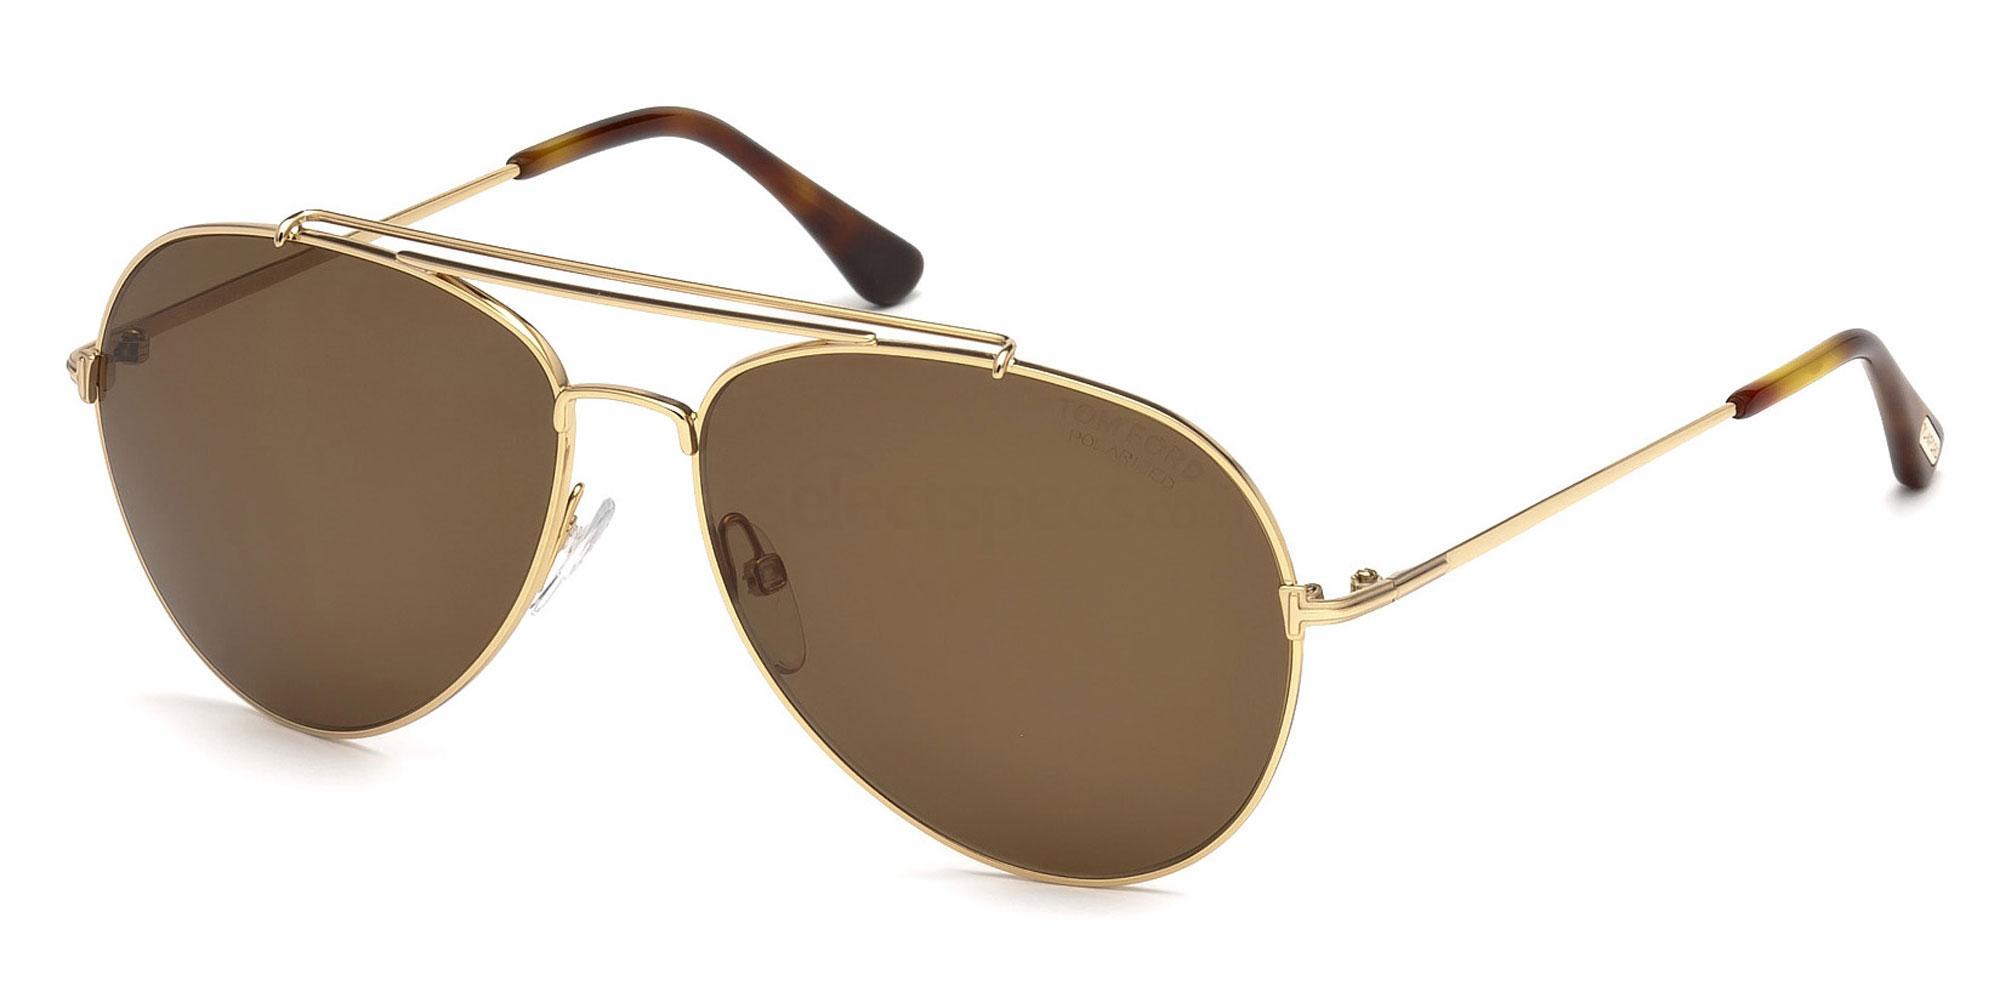 28H FT0497 Sunglasses, Tom Ford